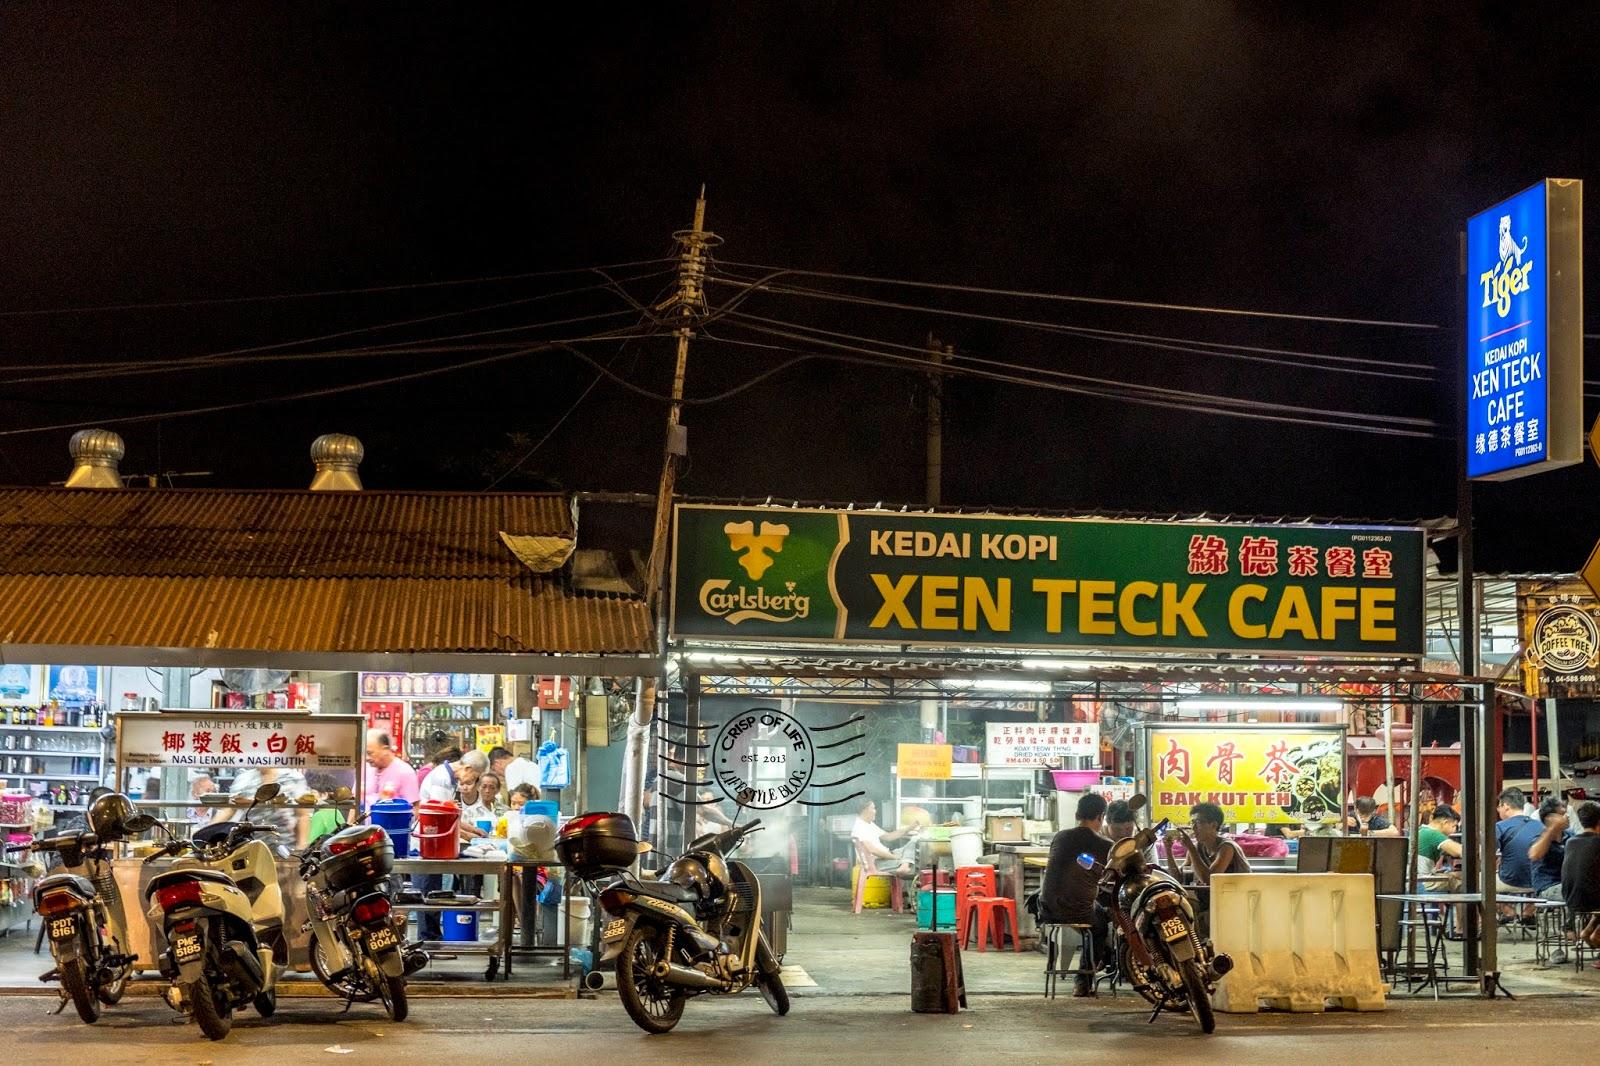 Midnight Chinese Nasi Lemak @ Weld Quay, Penang